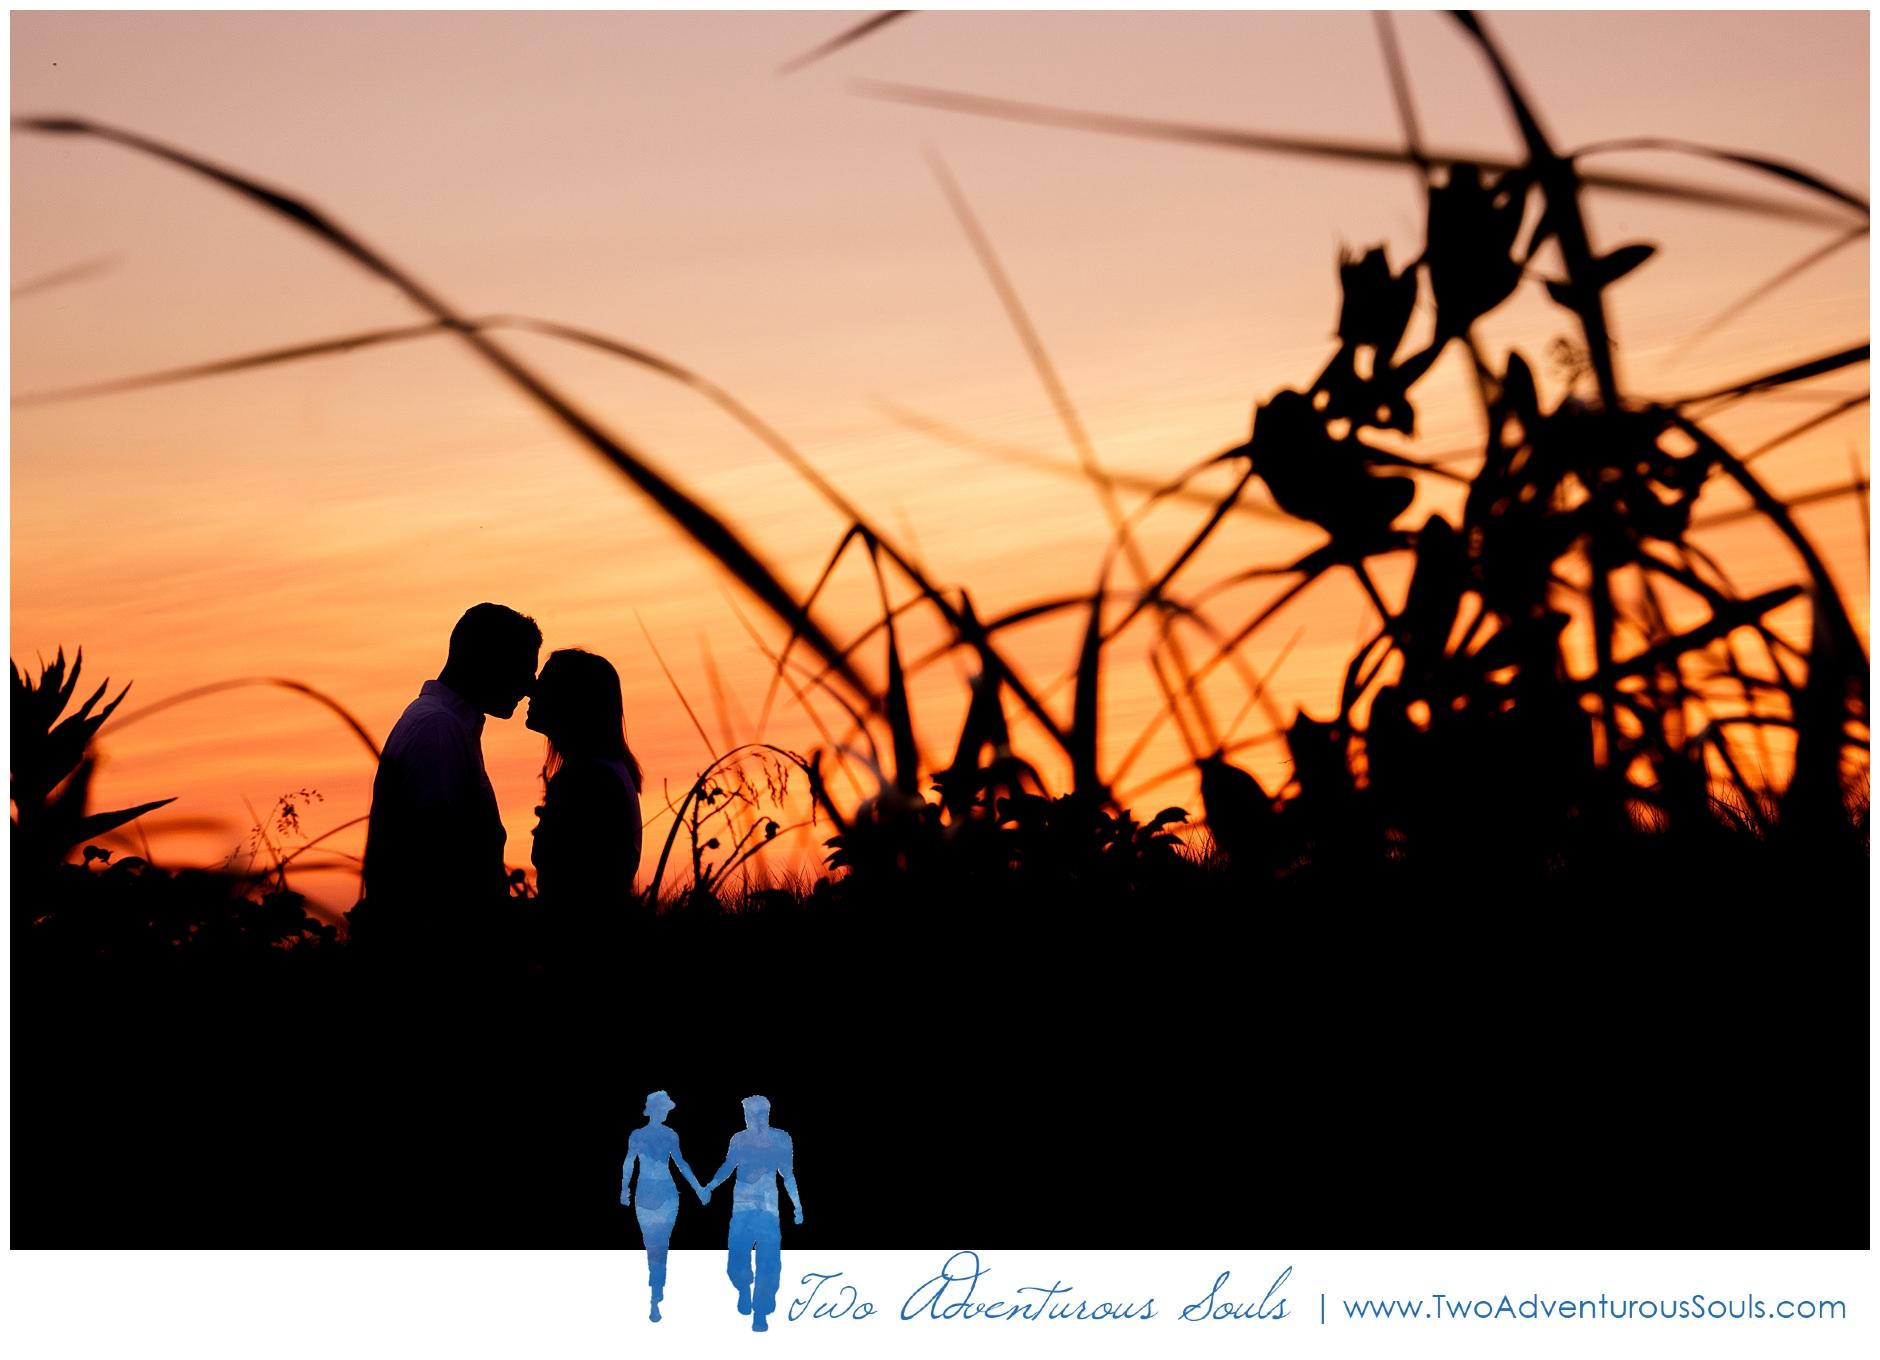 Maine Wedding Photographers, Connecticut Wedding Photographers, Old Orchard Beach Wedding Photographers, Two Adventurous Souls-JustinElise_0011.jpg